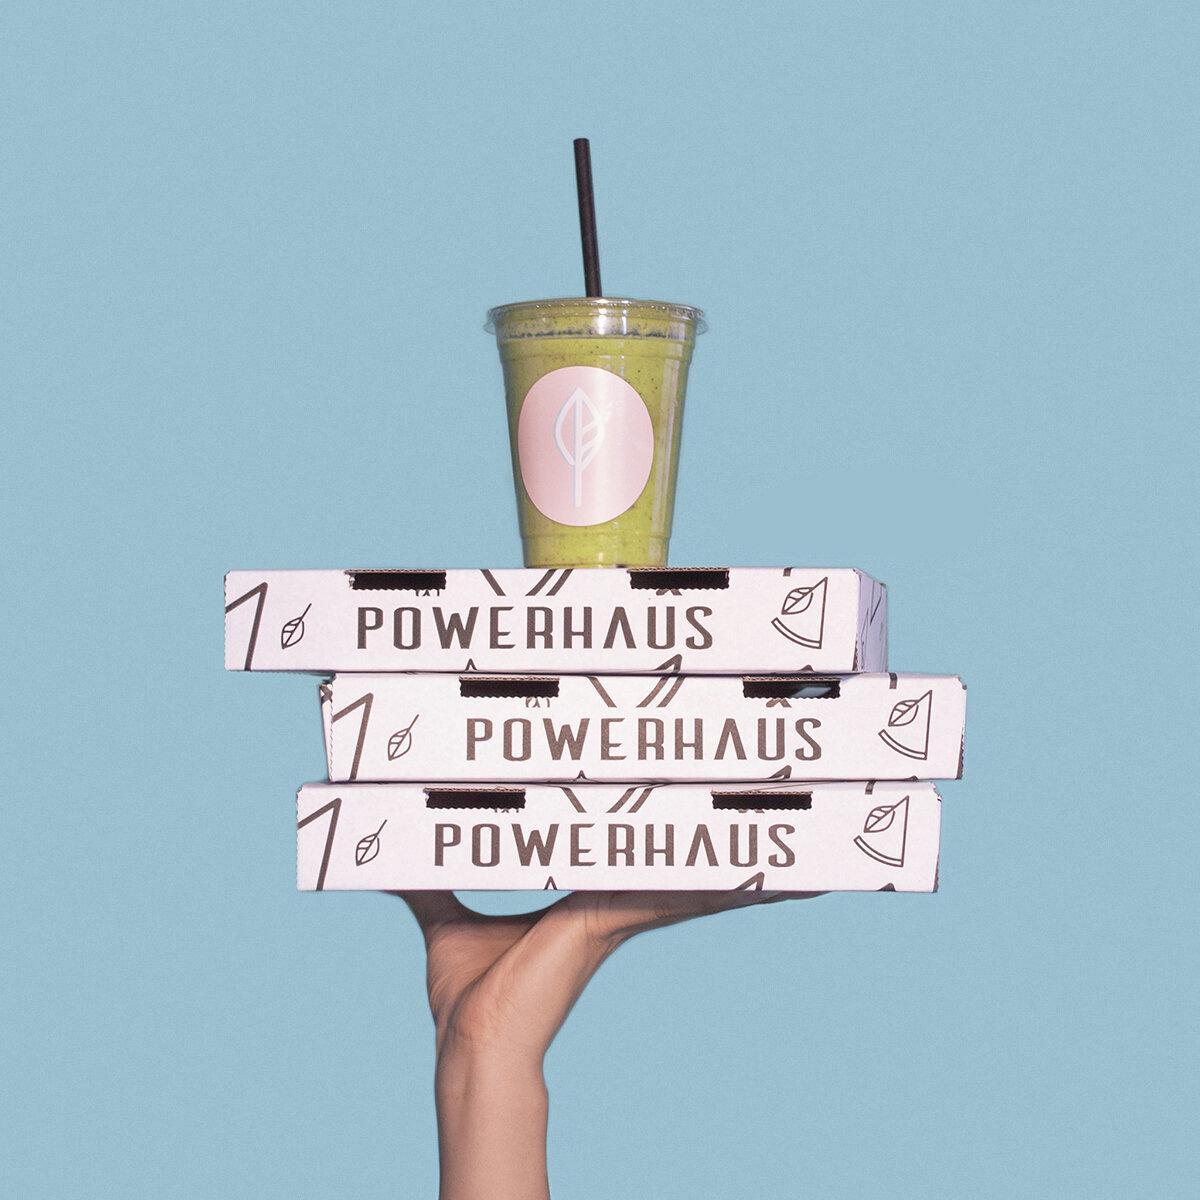 Powerhaus_igcontent_august-09-1